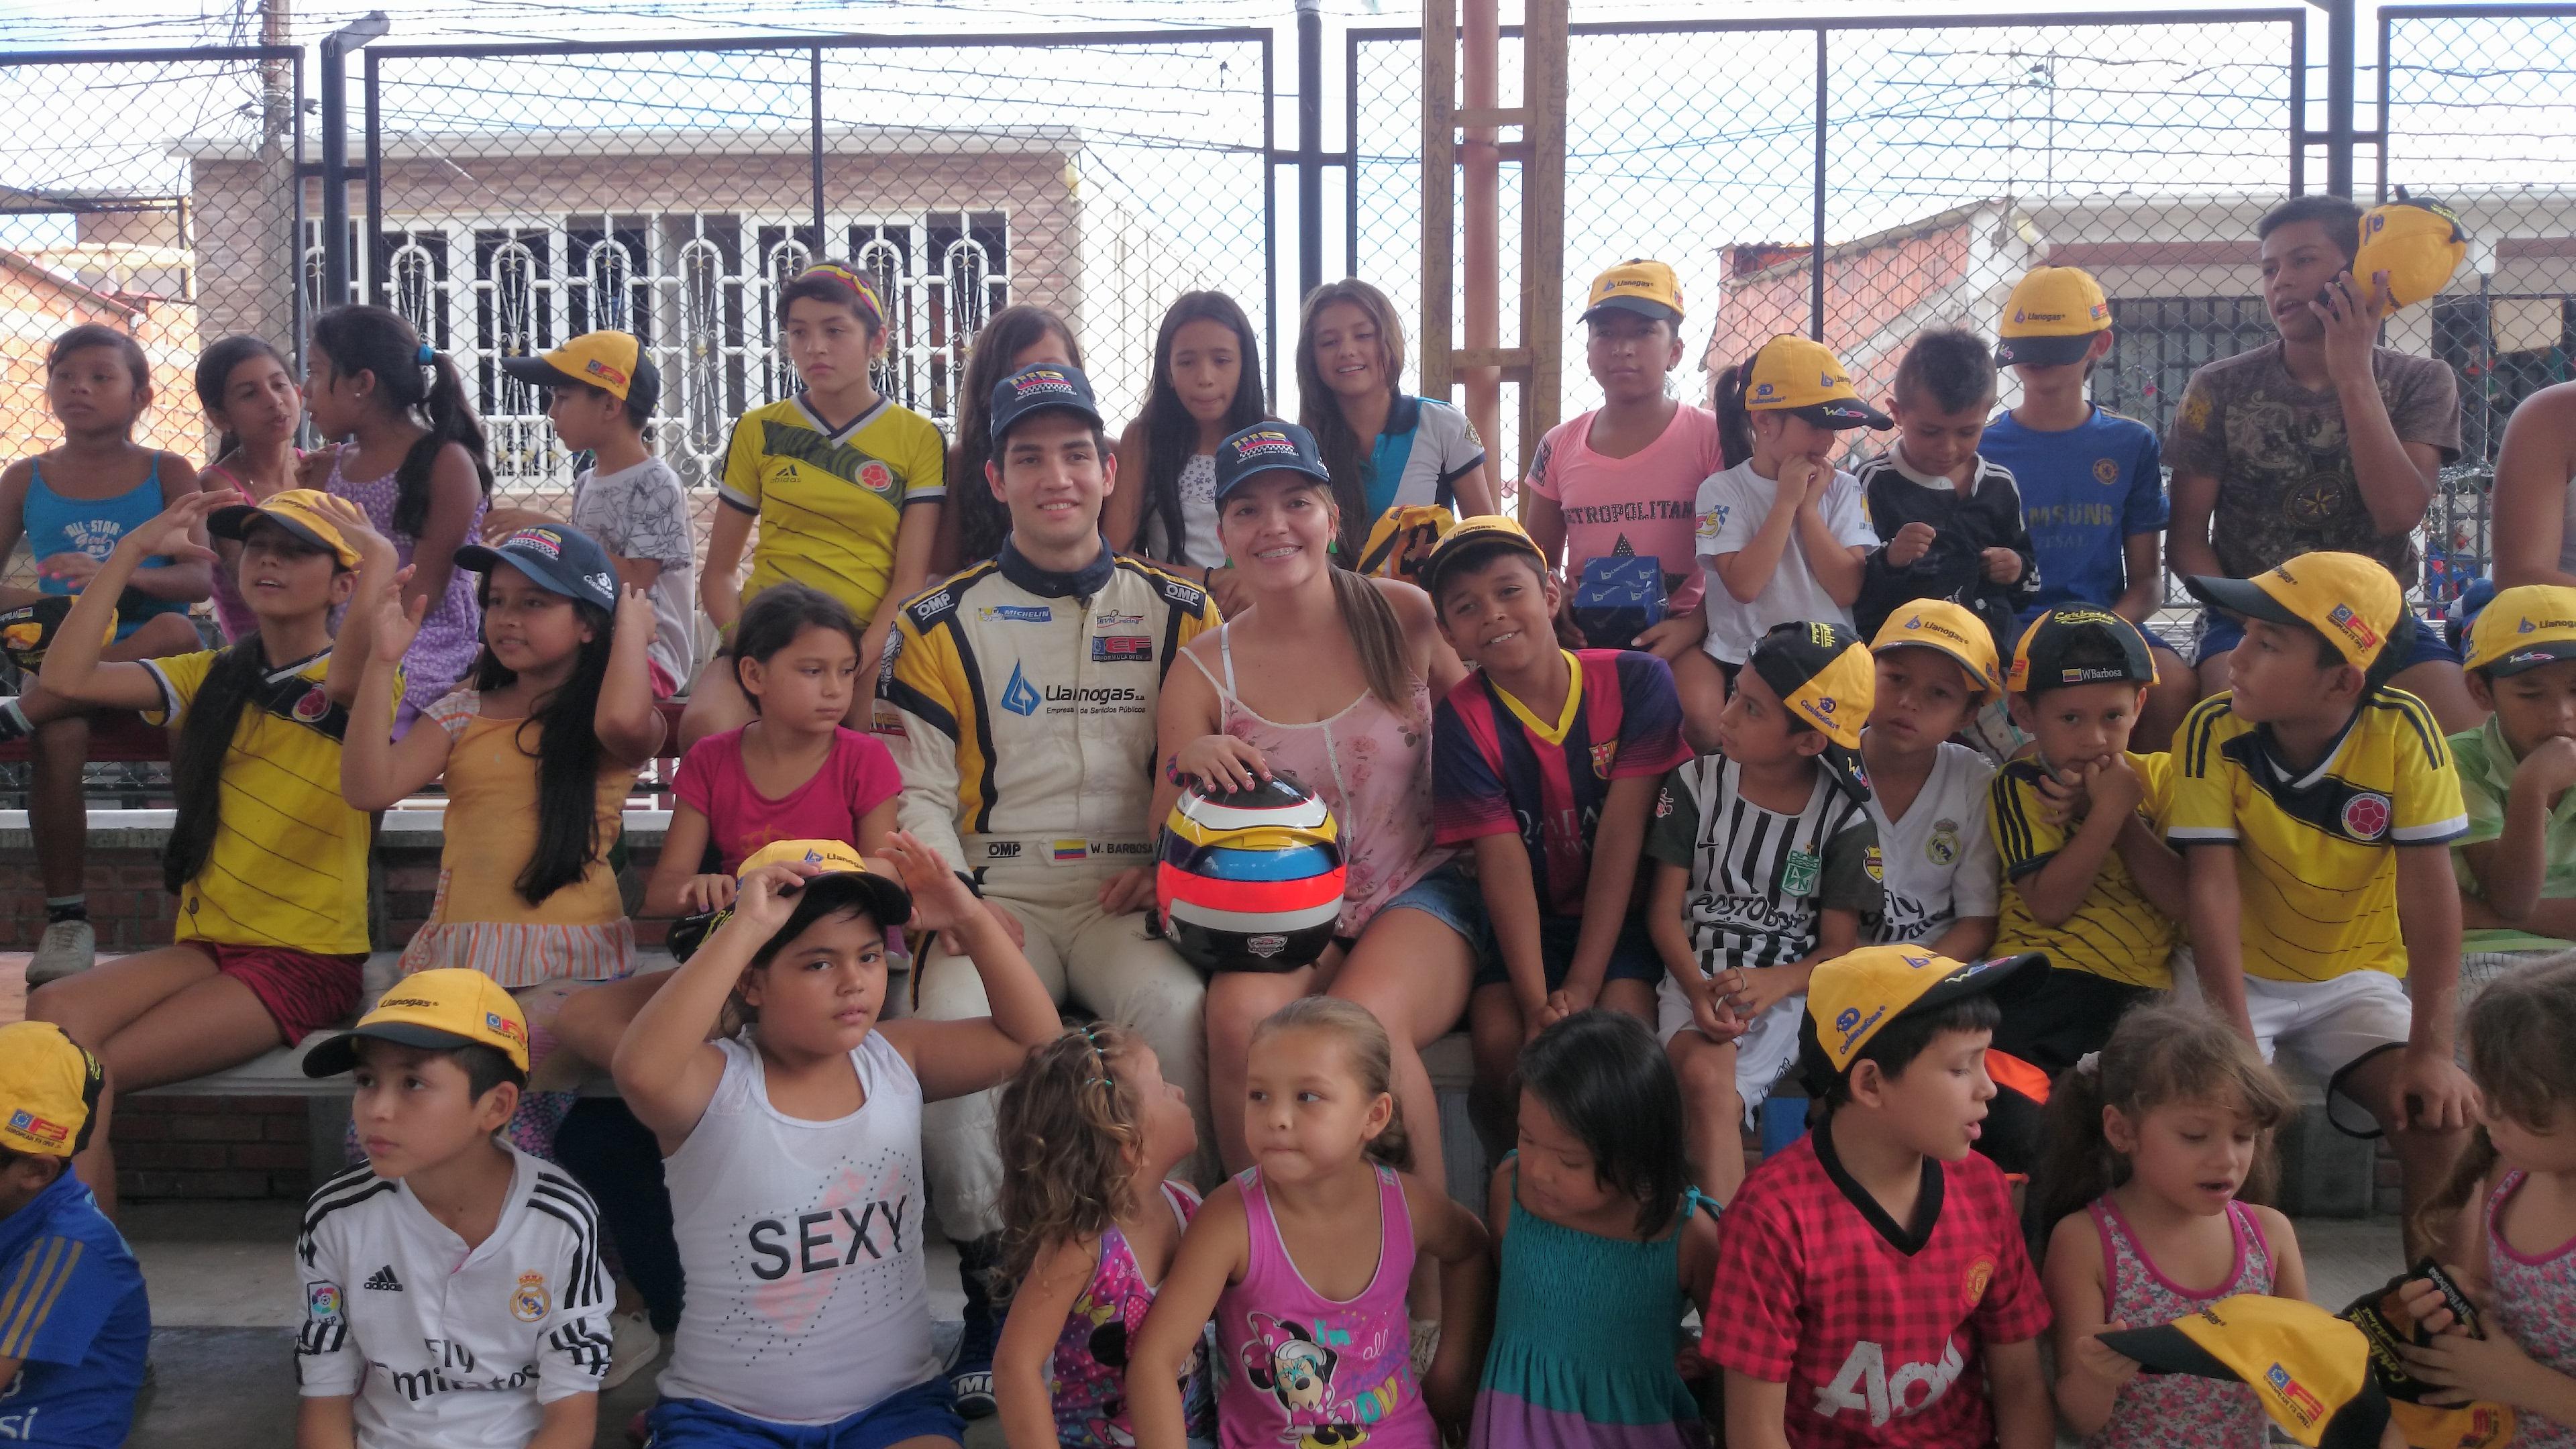 William_Barbosa_G._FundacióngolesdeVida_2783